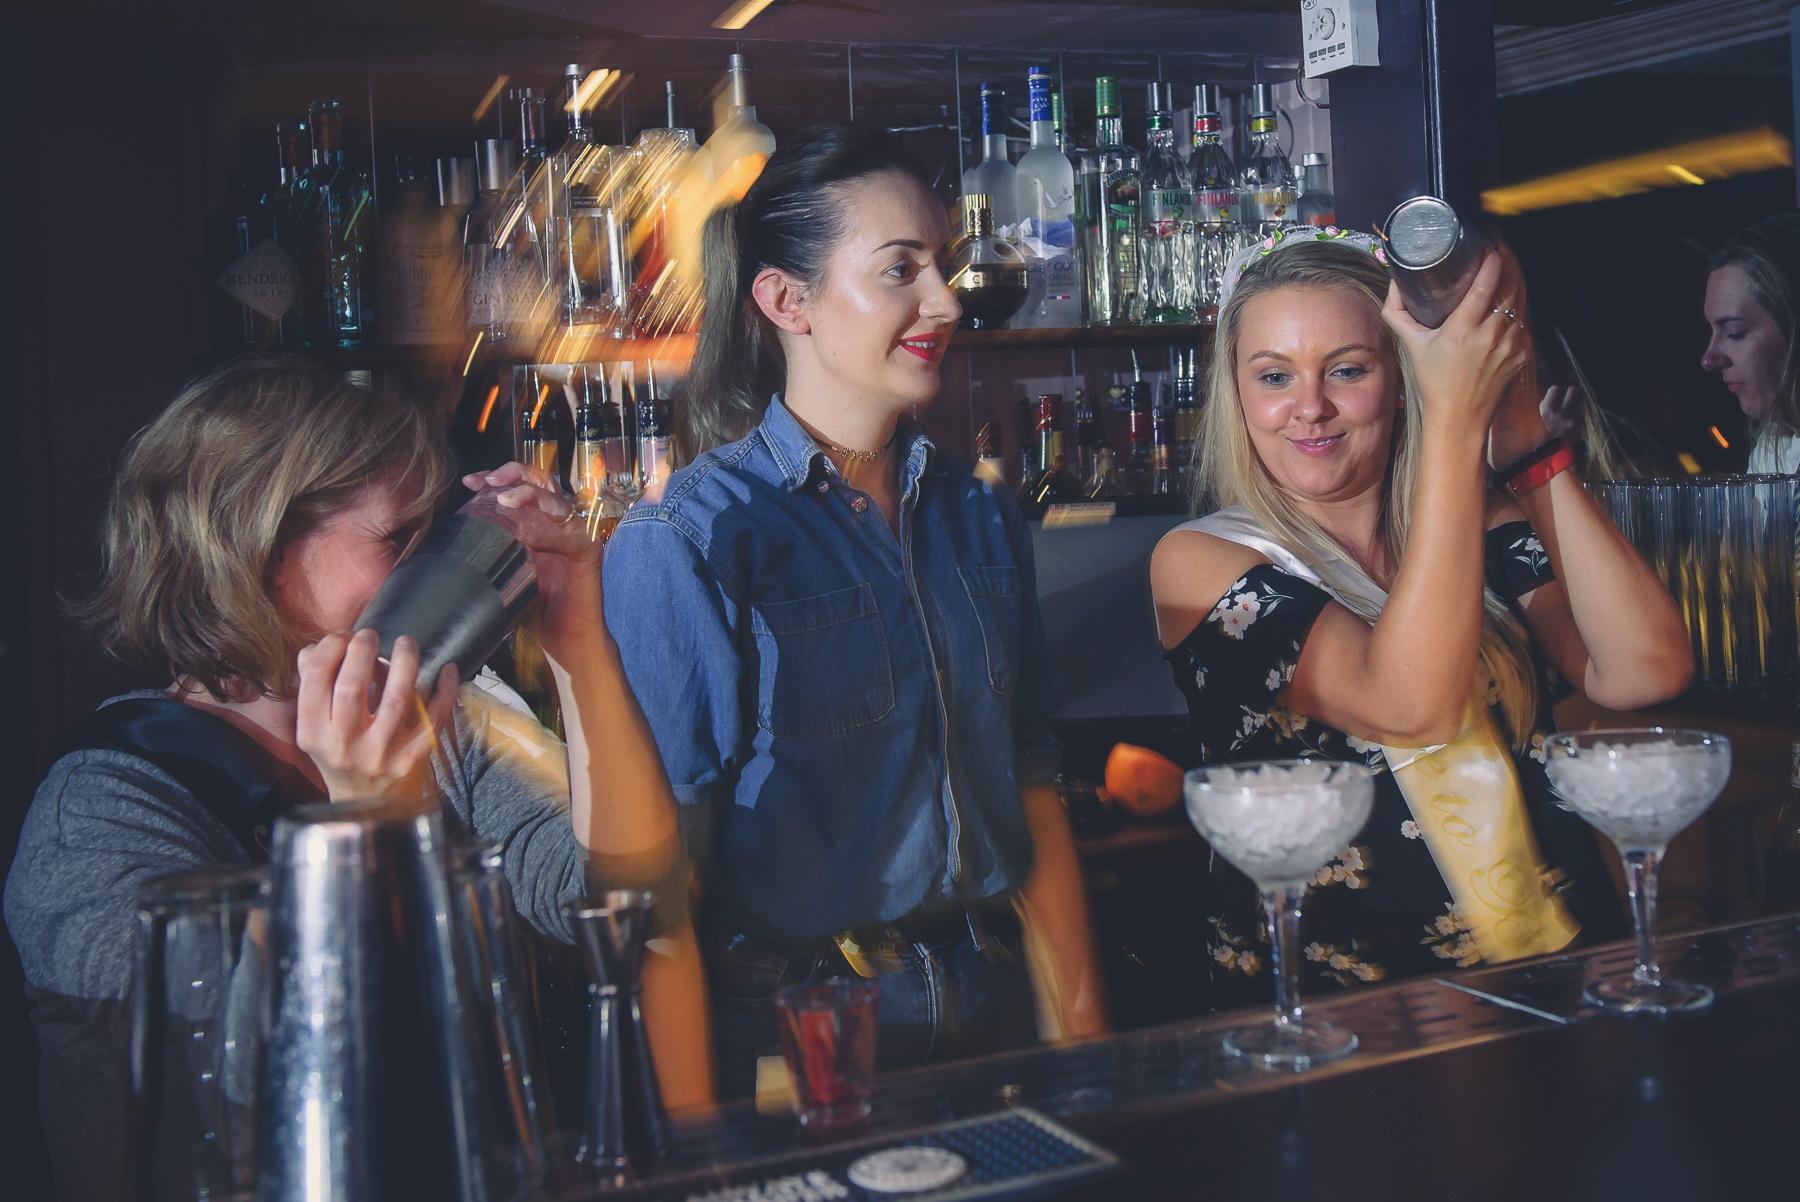 Angels cocktail bar Oxford Angels 06.10.2018-111.jpg